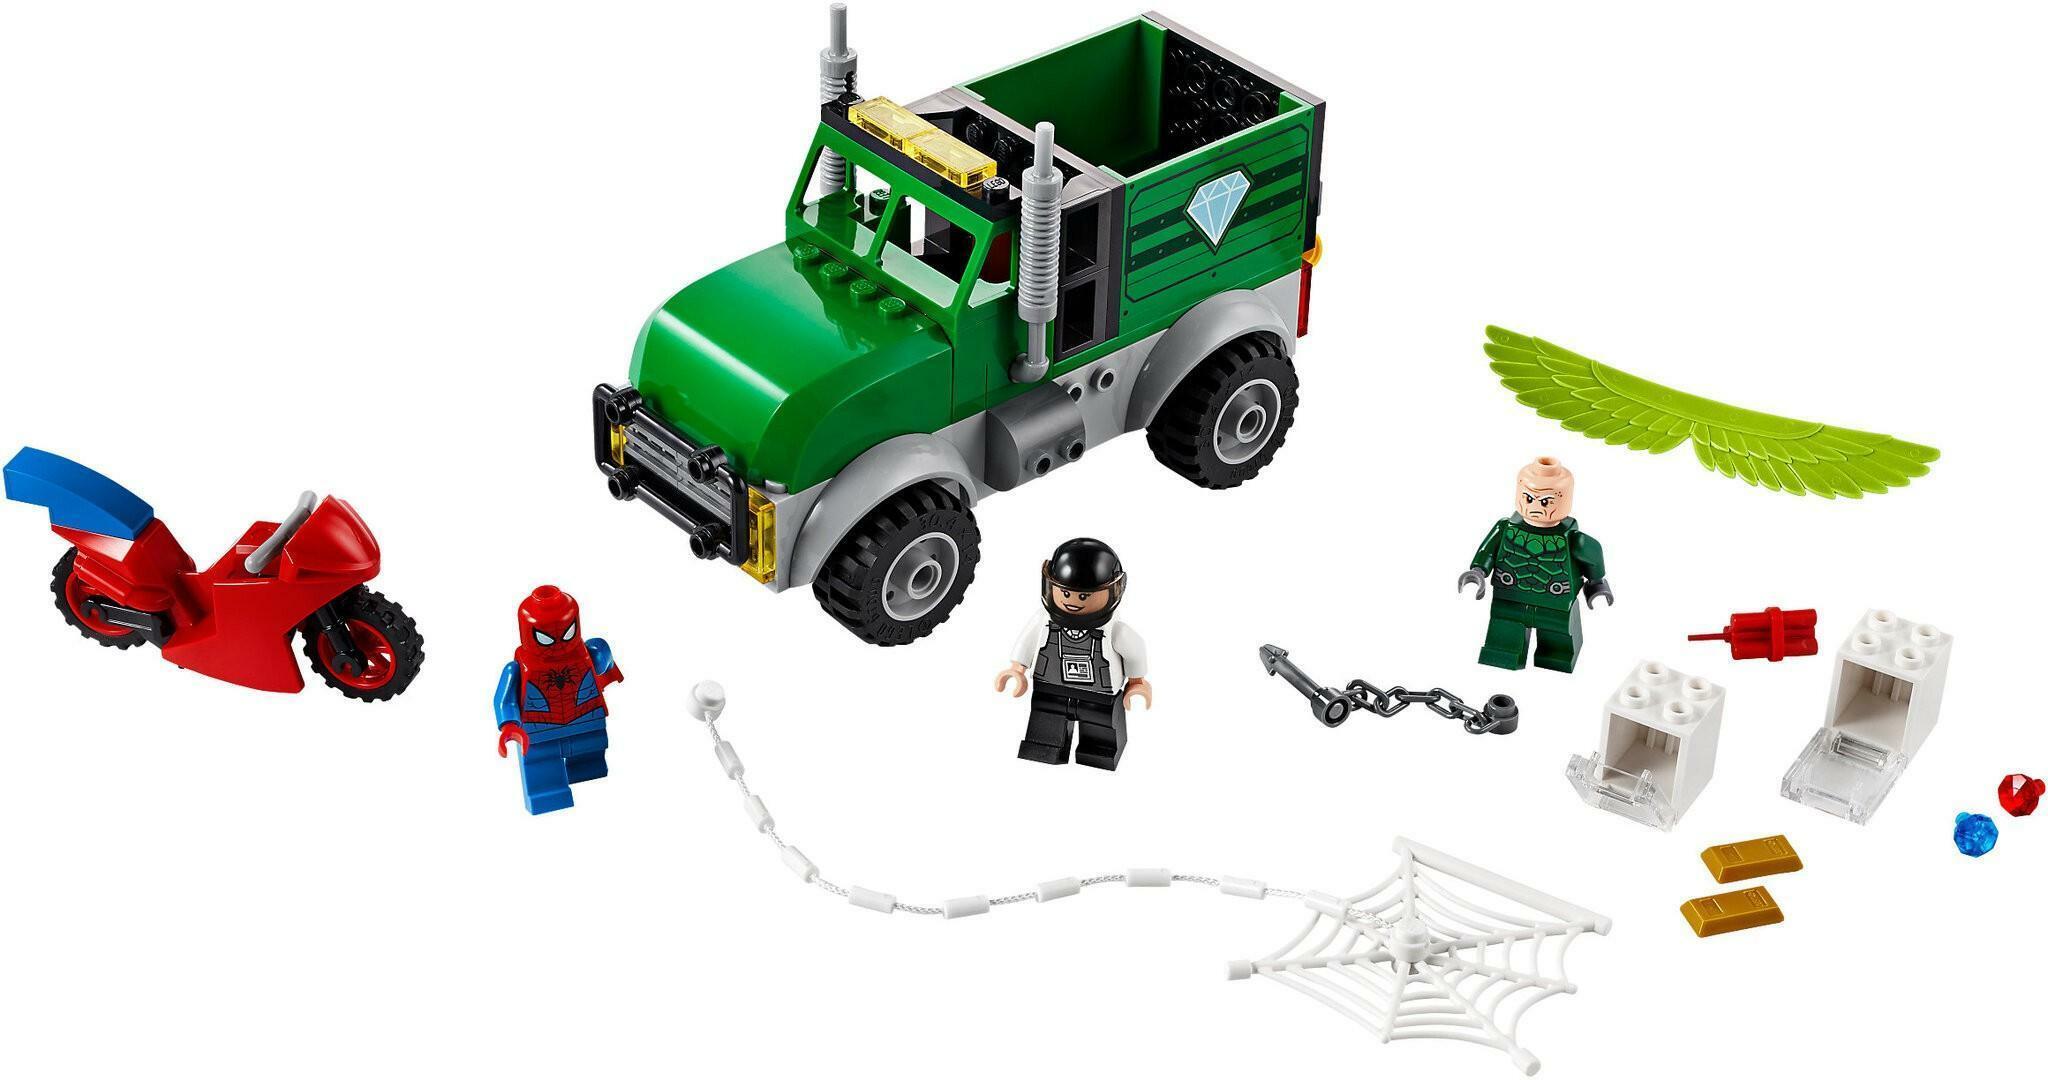 lego lego marvel 76147 - avvoltoio e la rapina del camion